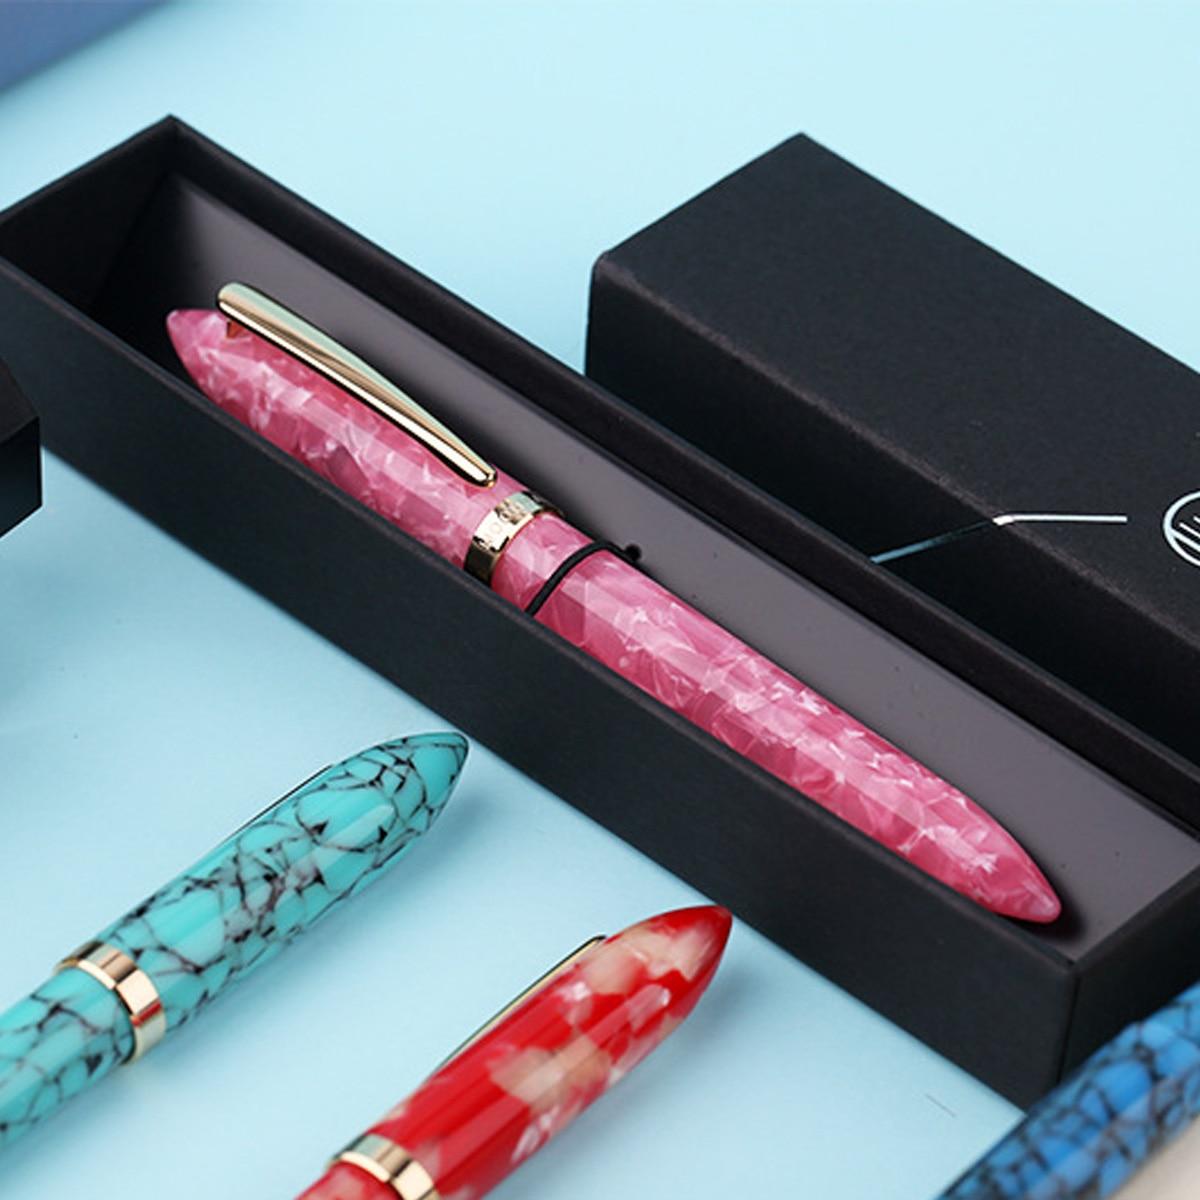 KICUTE negocio Metal pluma S1 resina colorida pluma convertidor pluma EF/F Nib único con caja de regalo